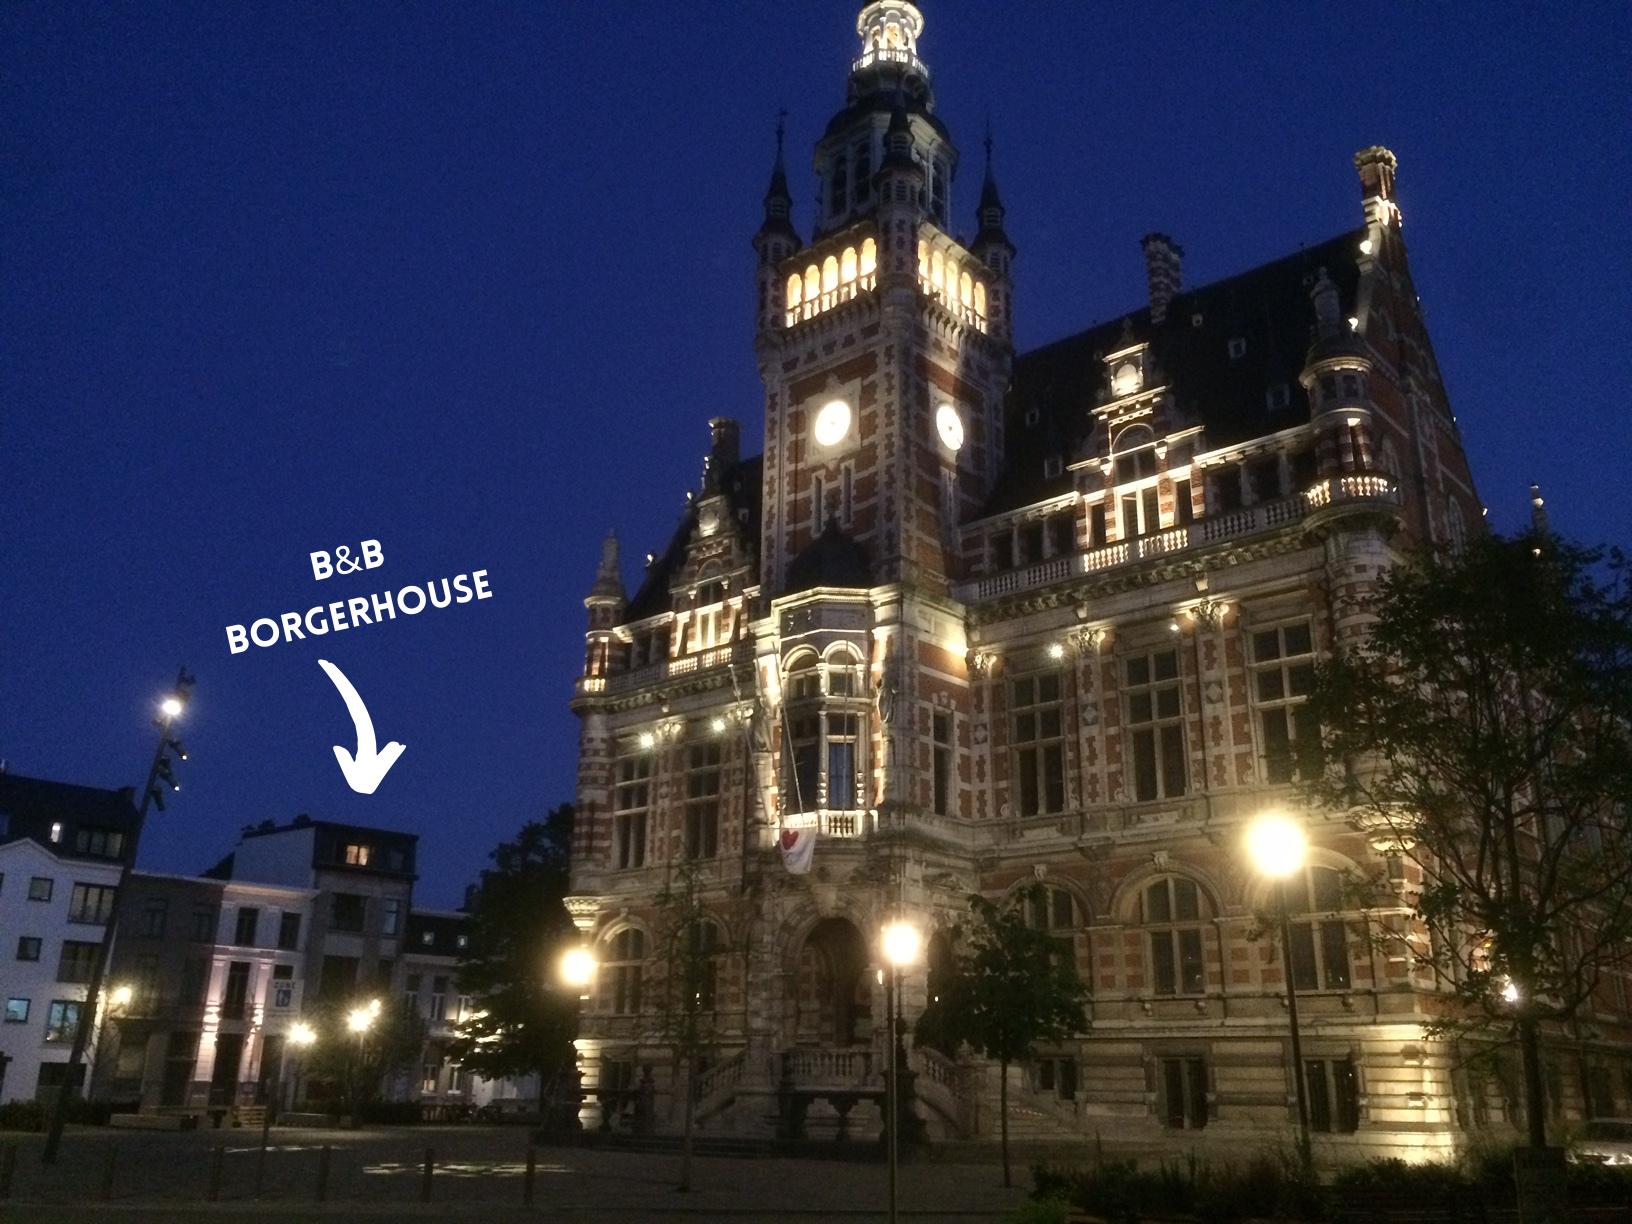 Borgerhouse